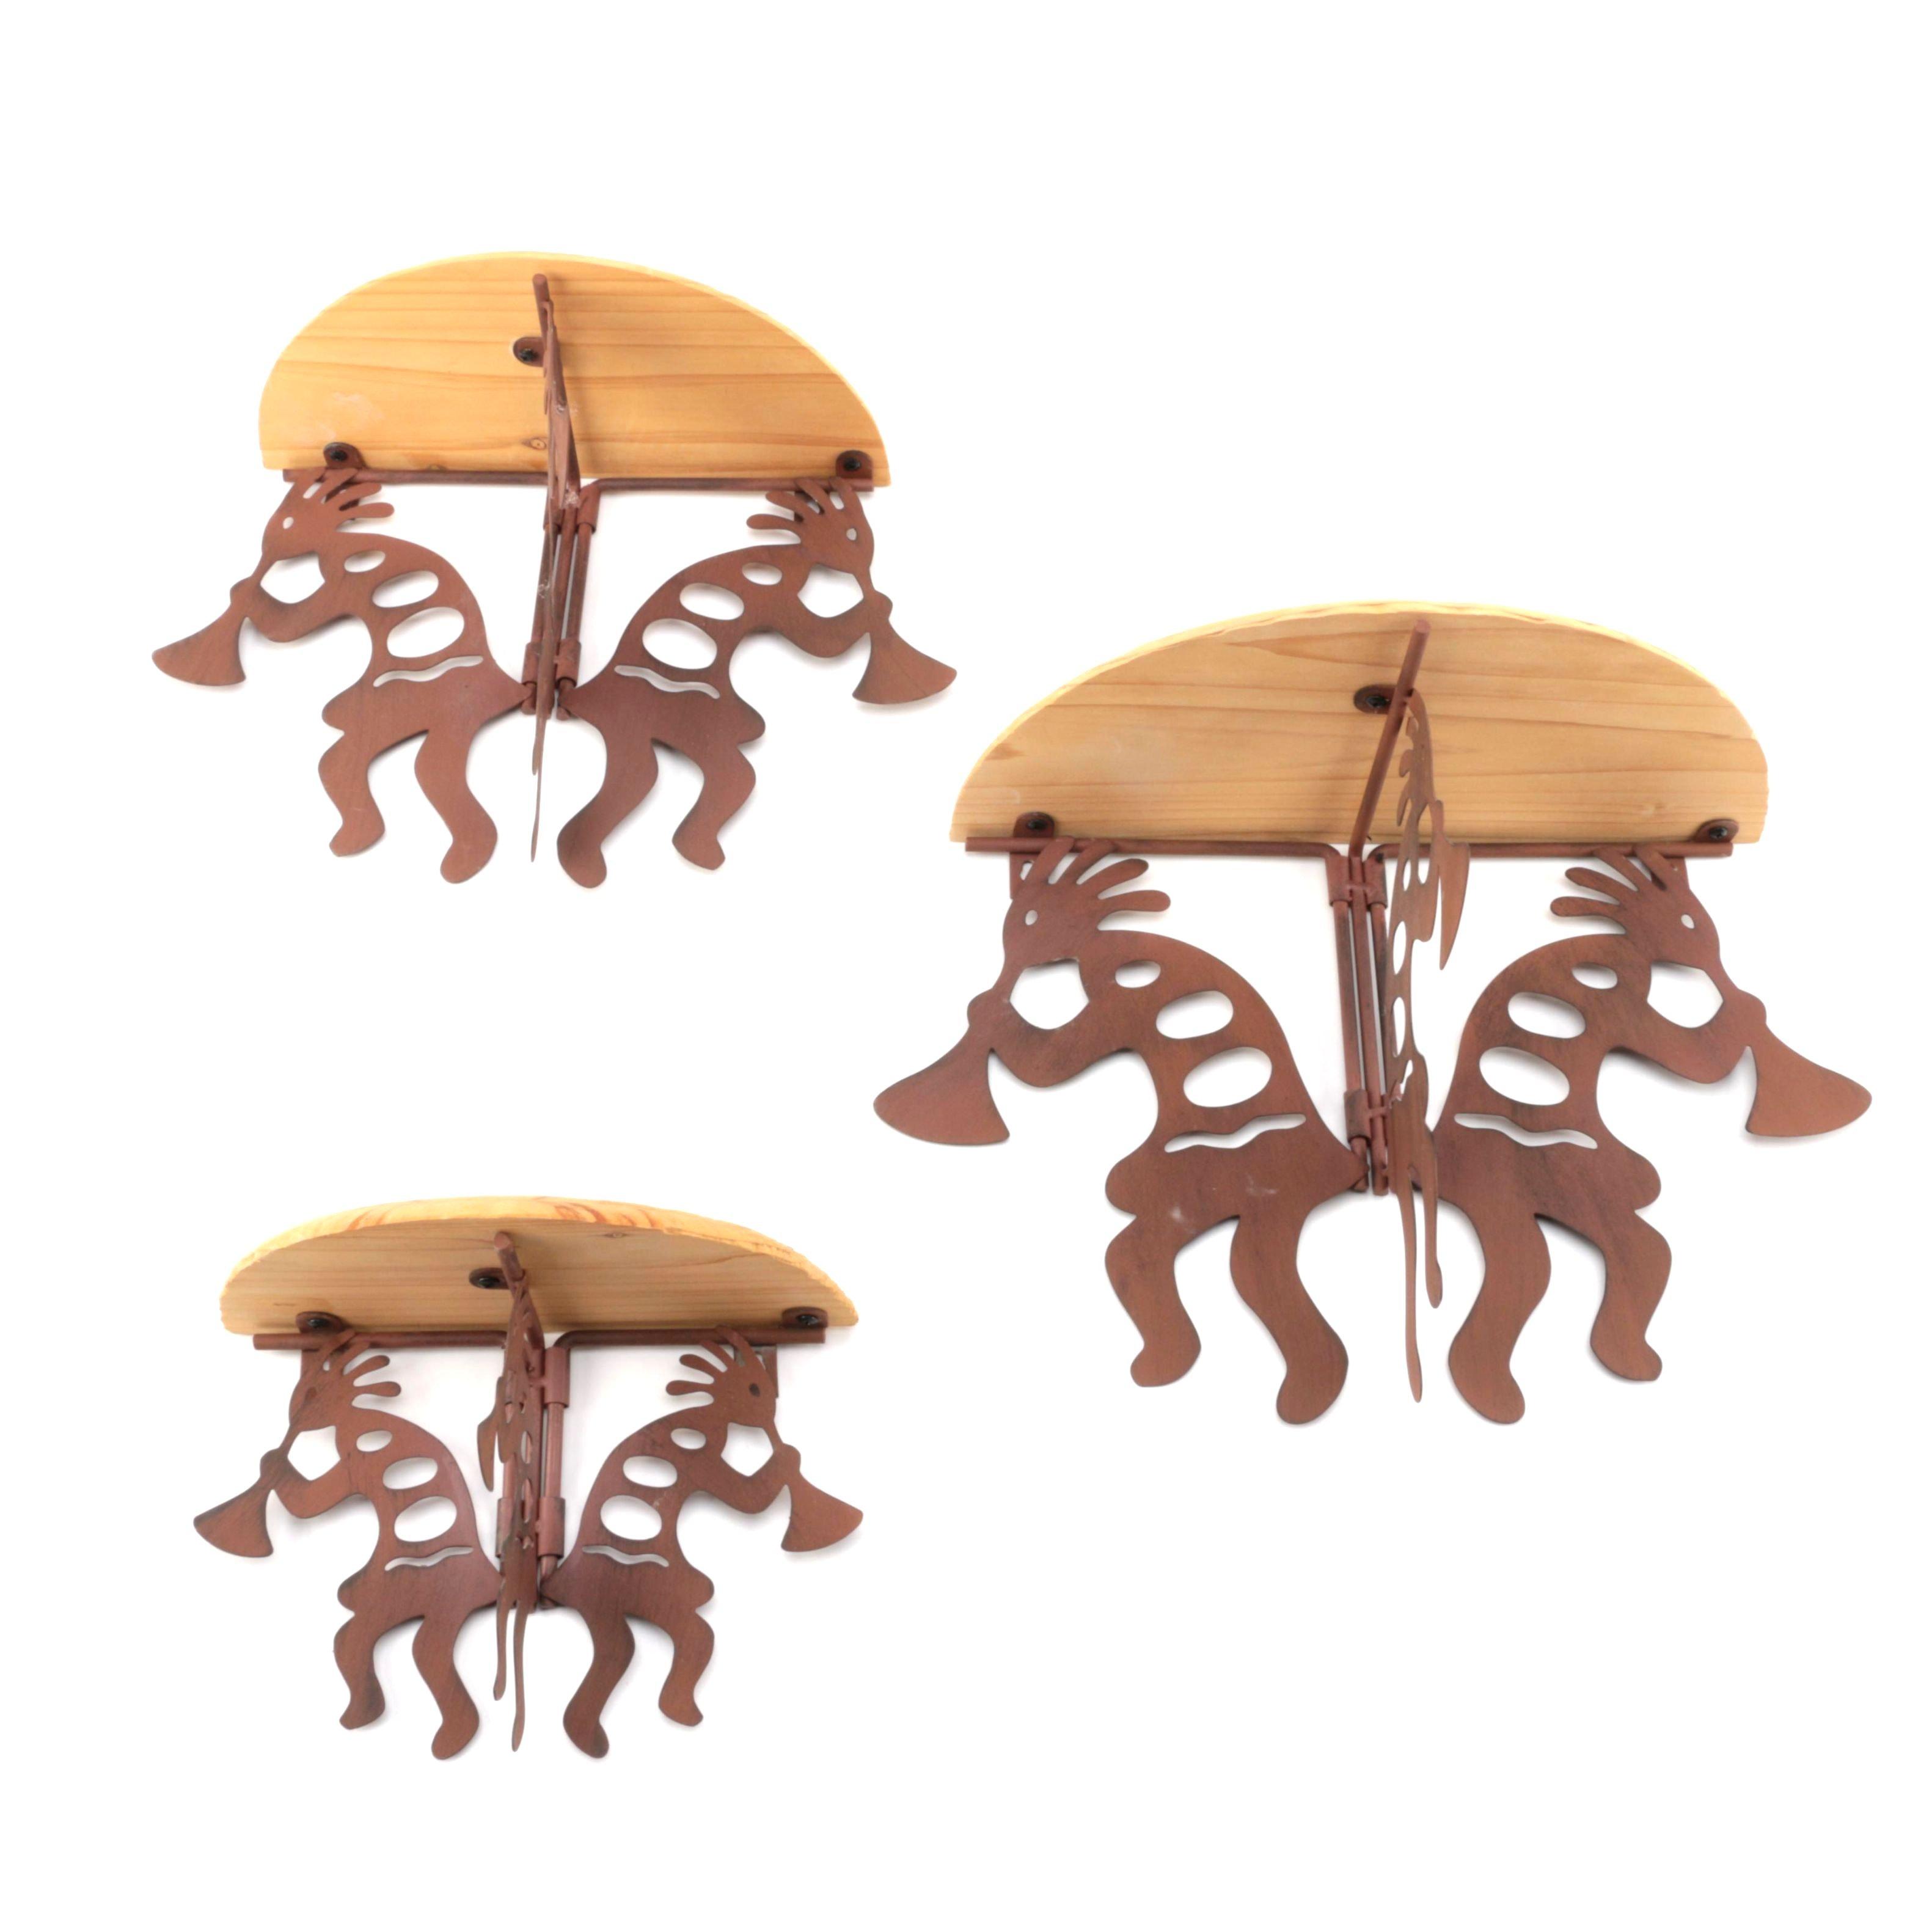 Decorative Wood and Metal Figure Wall Shelves